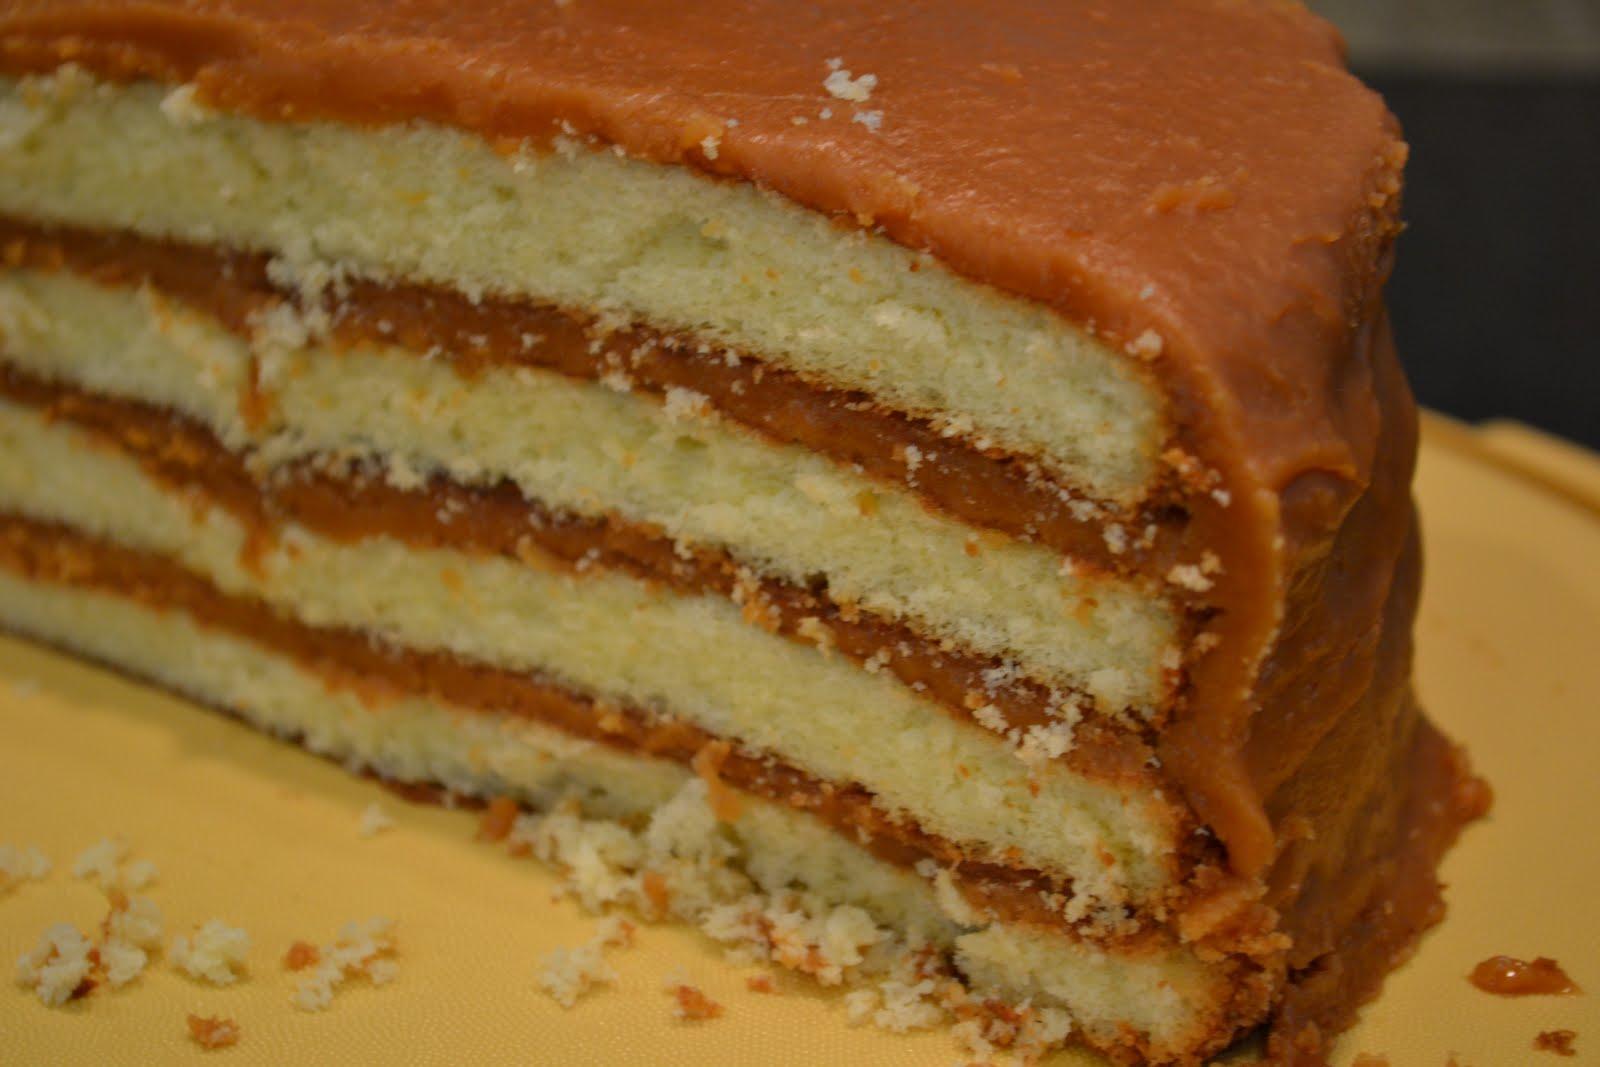 Mama S Cake Recipe Italian: Southern Accents: Mama's Old Fashioned Caramel Cake (Icing